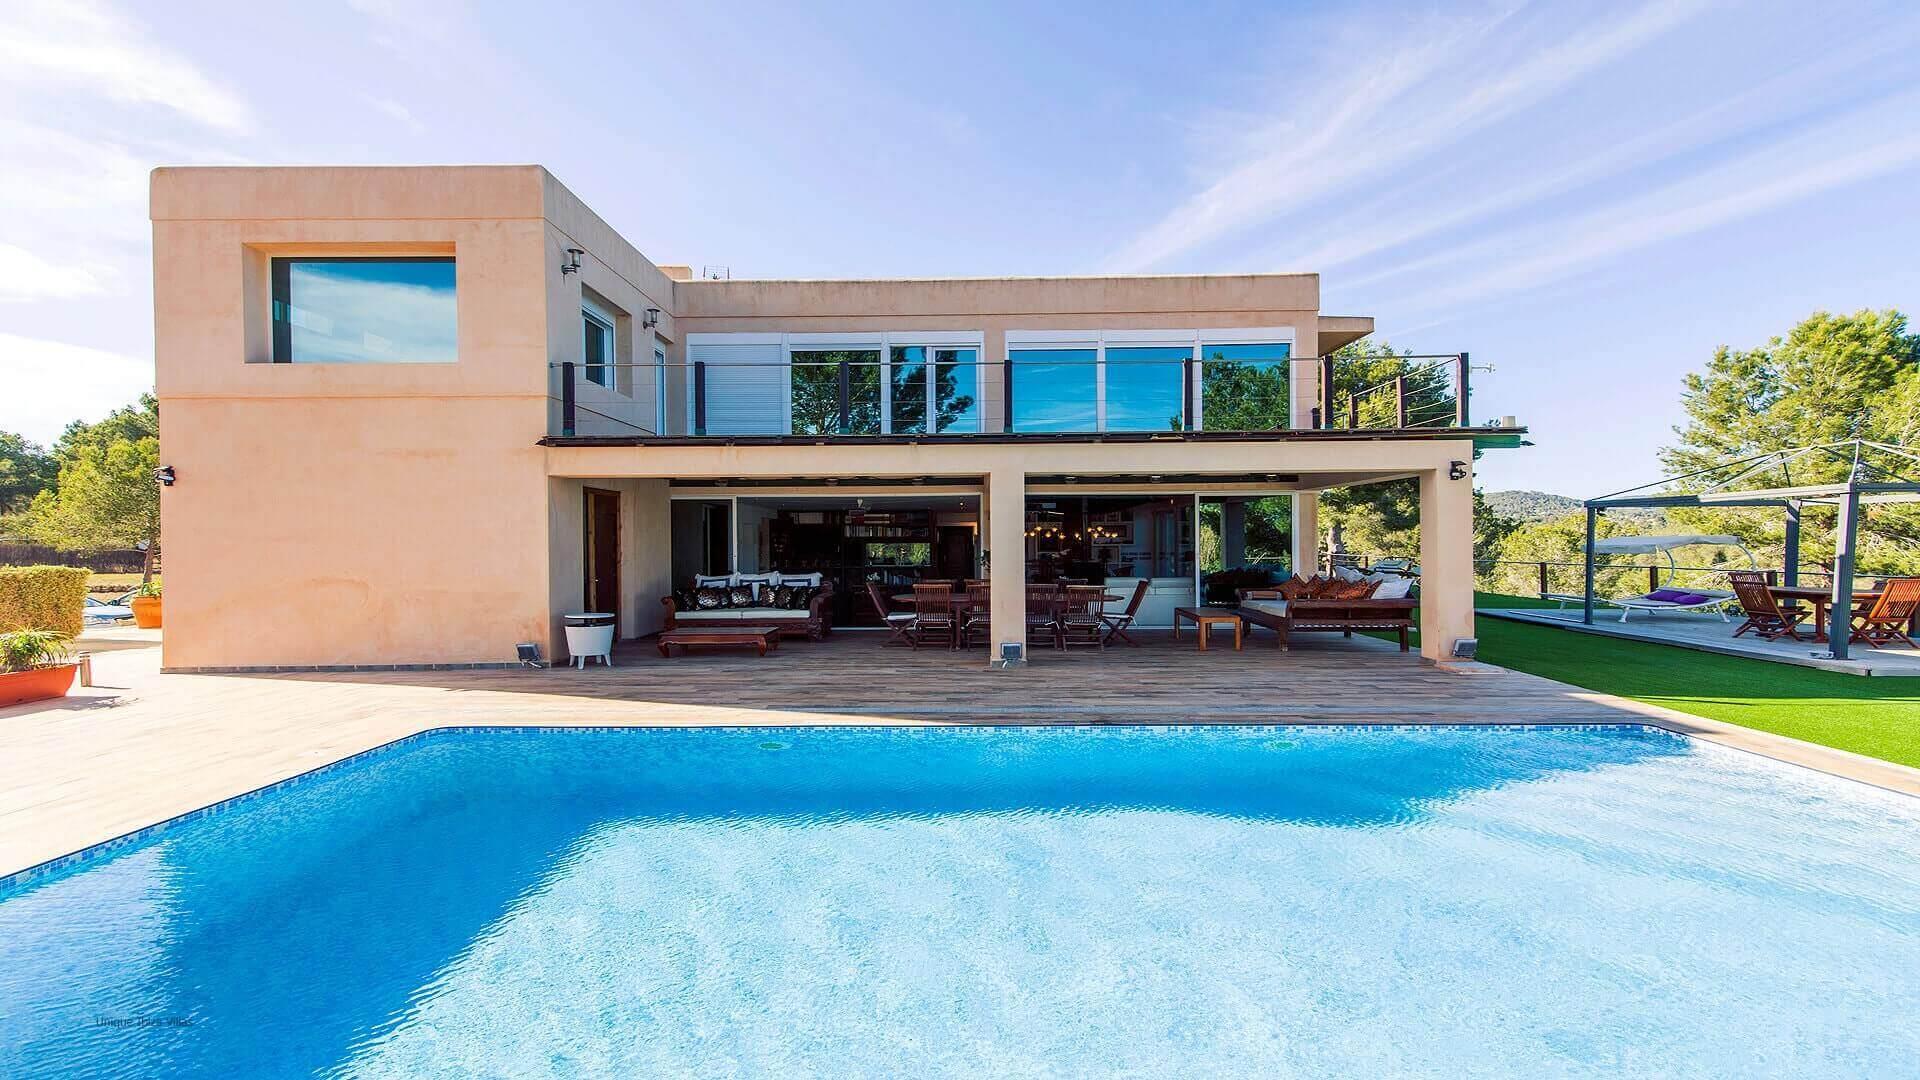 Villa Paissa Ibiza 1 Near Cala Jondal